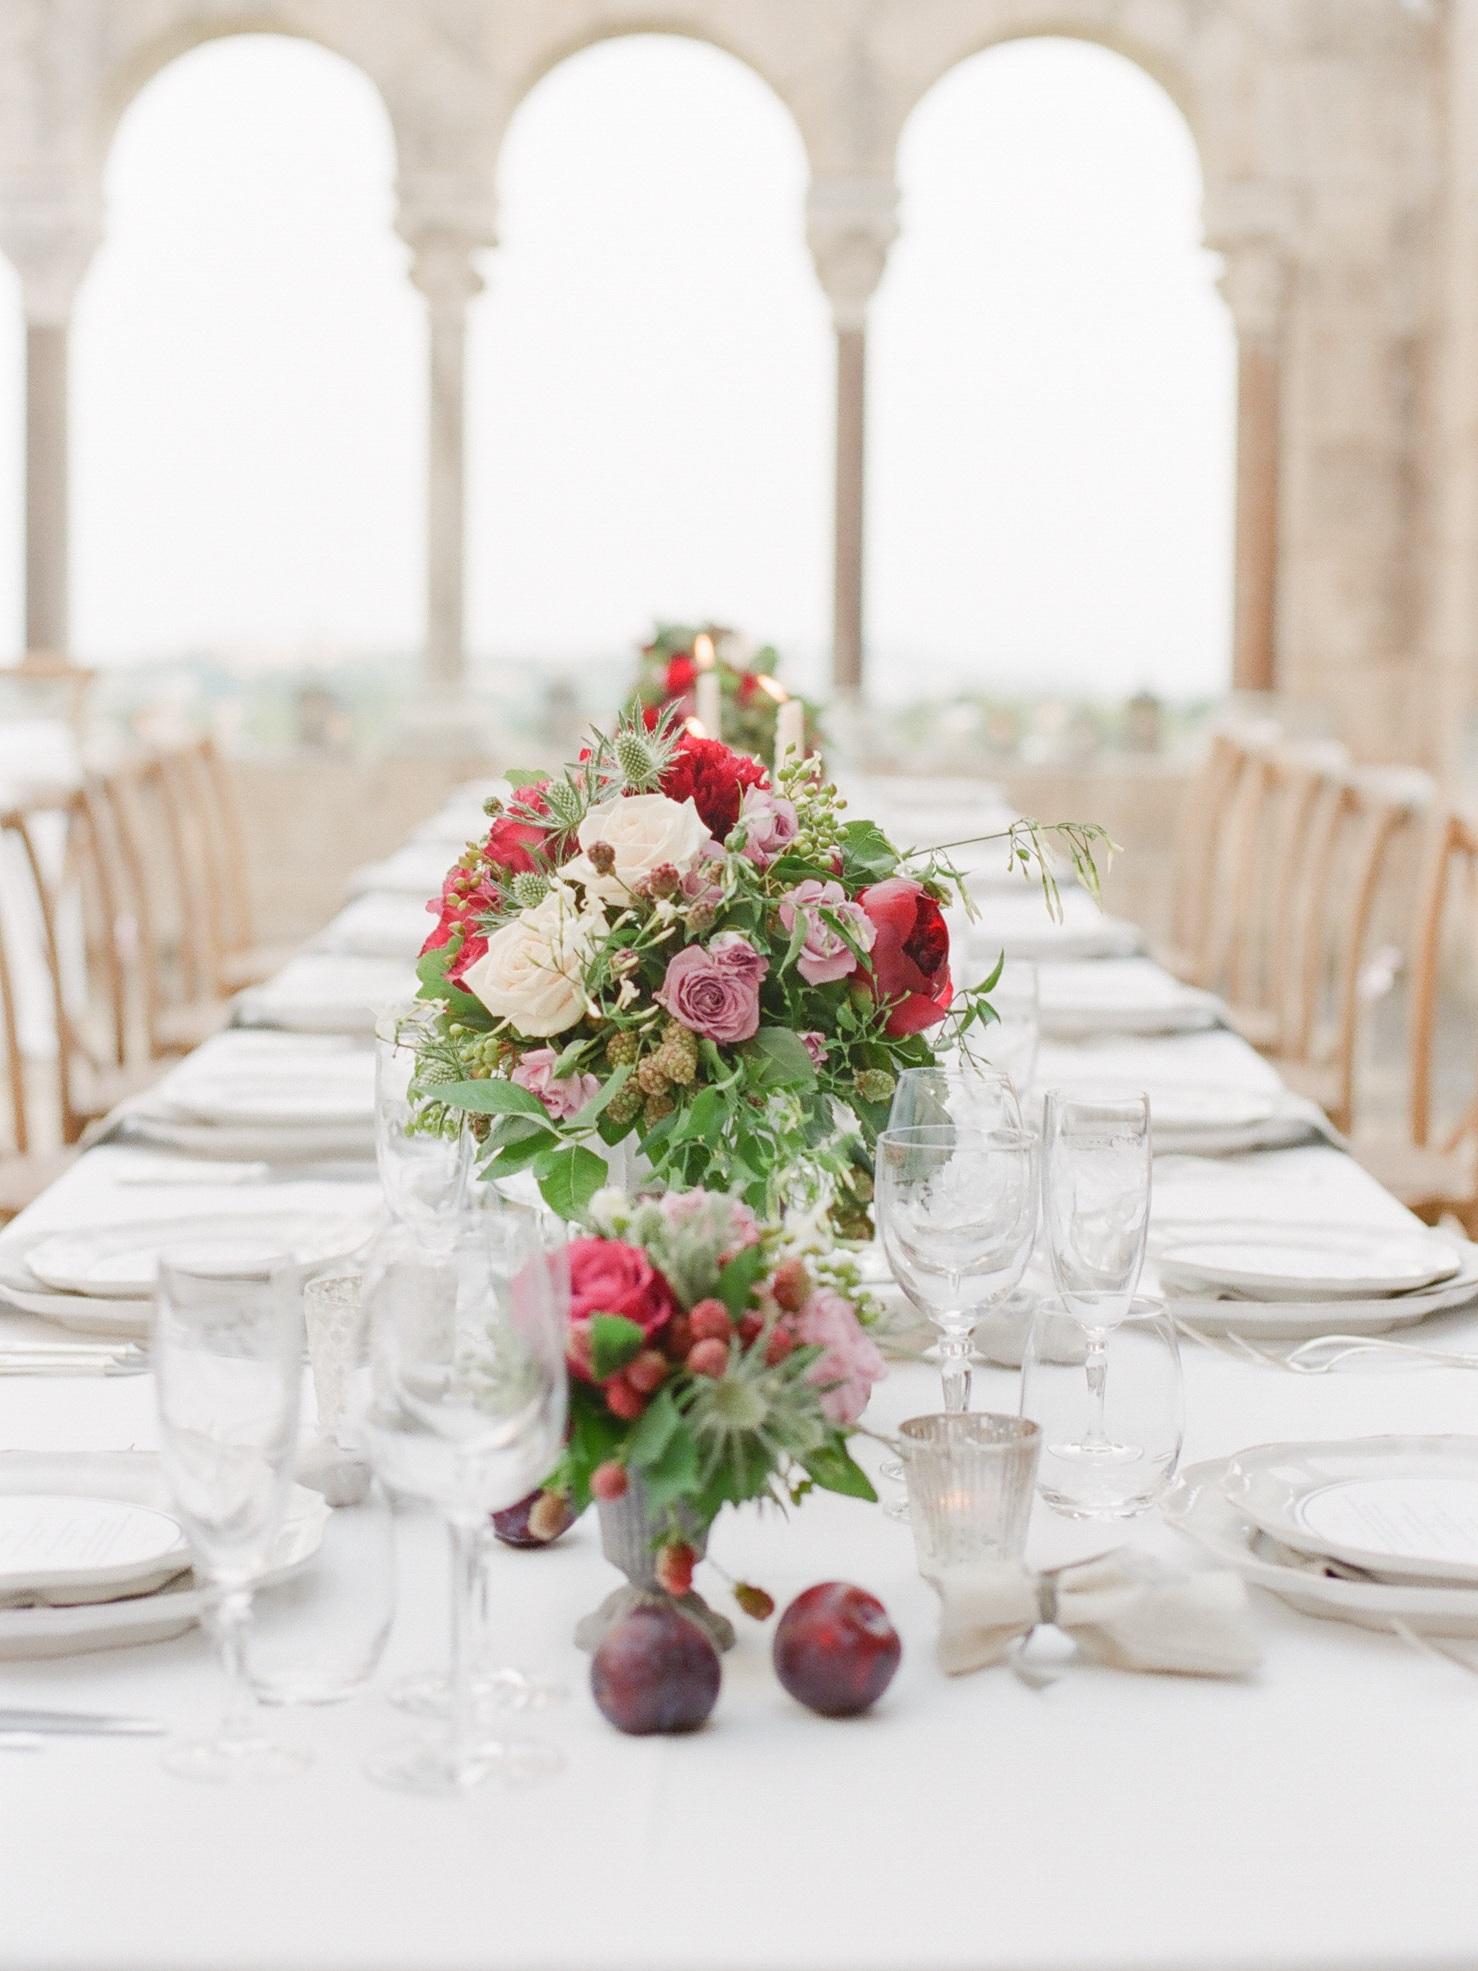 French_Wedding_(c)_Rory_Wylie-53.jpg